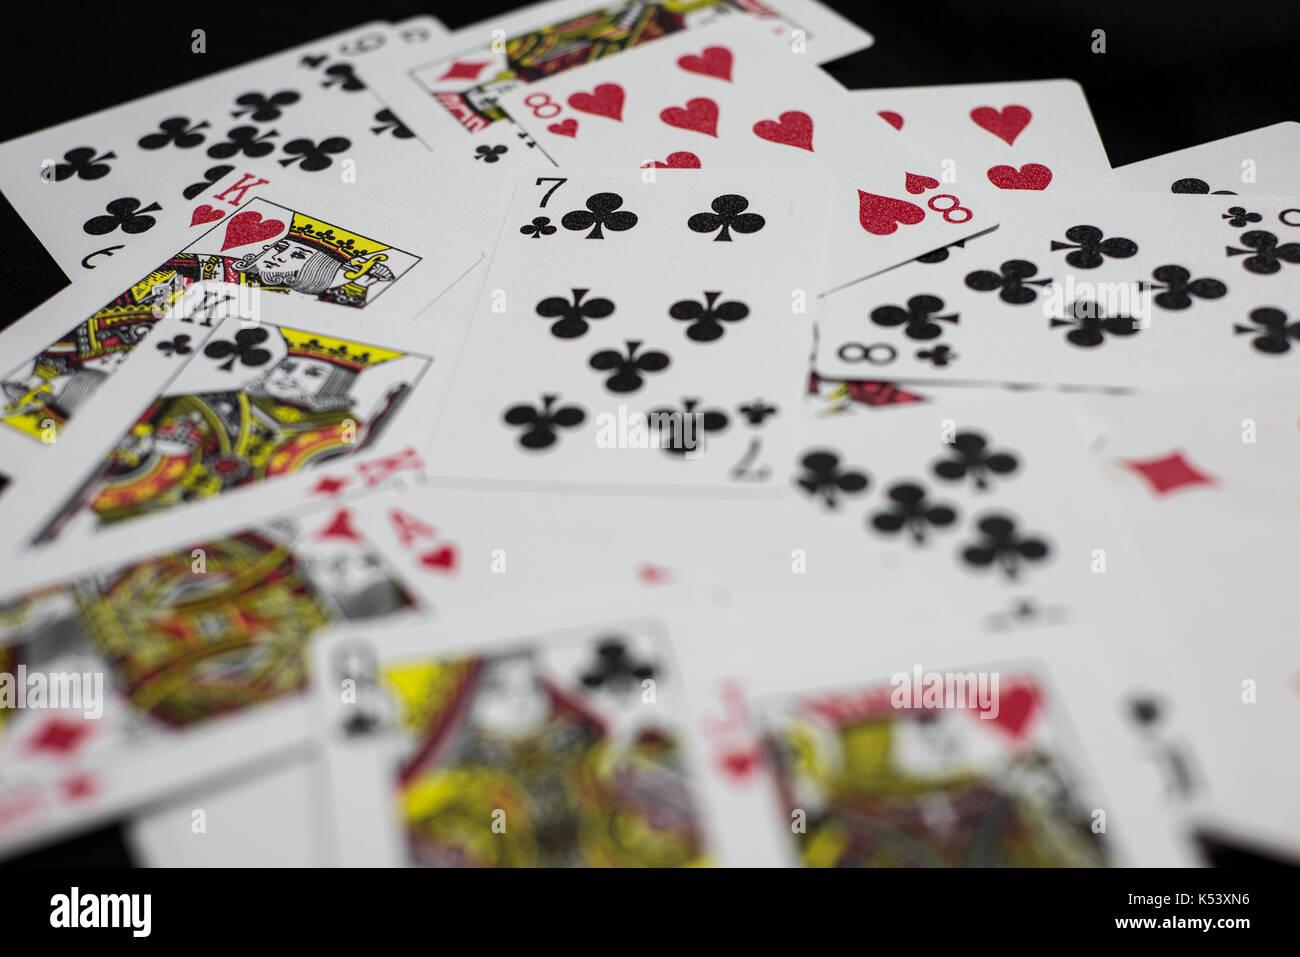 how to play rummikub card game